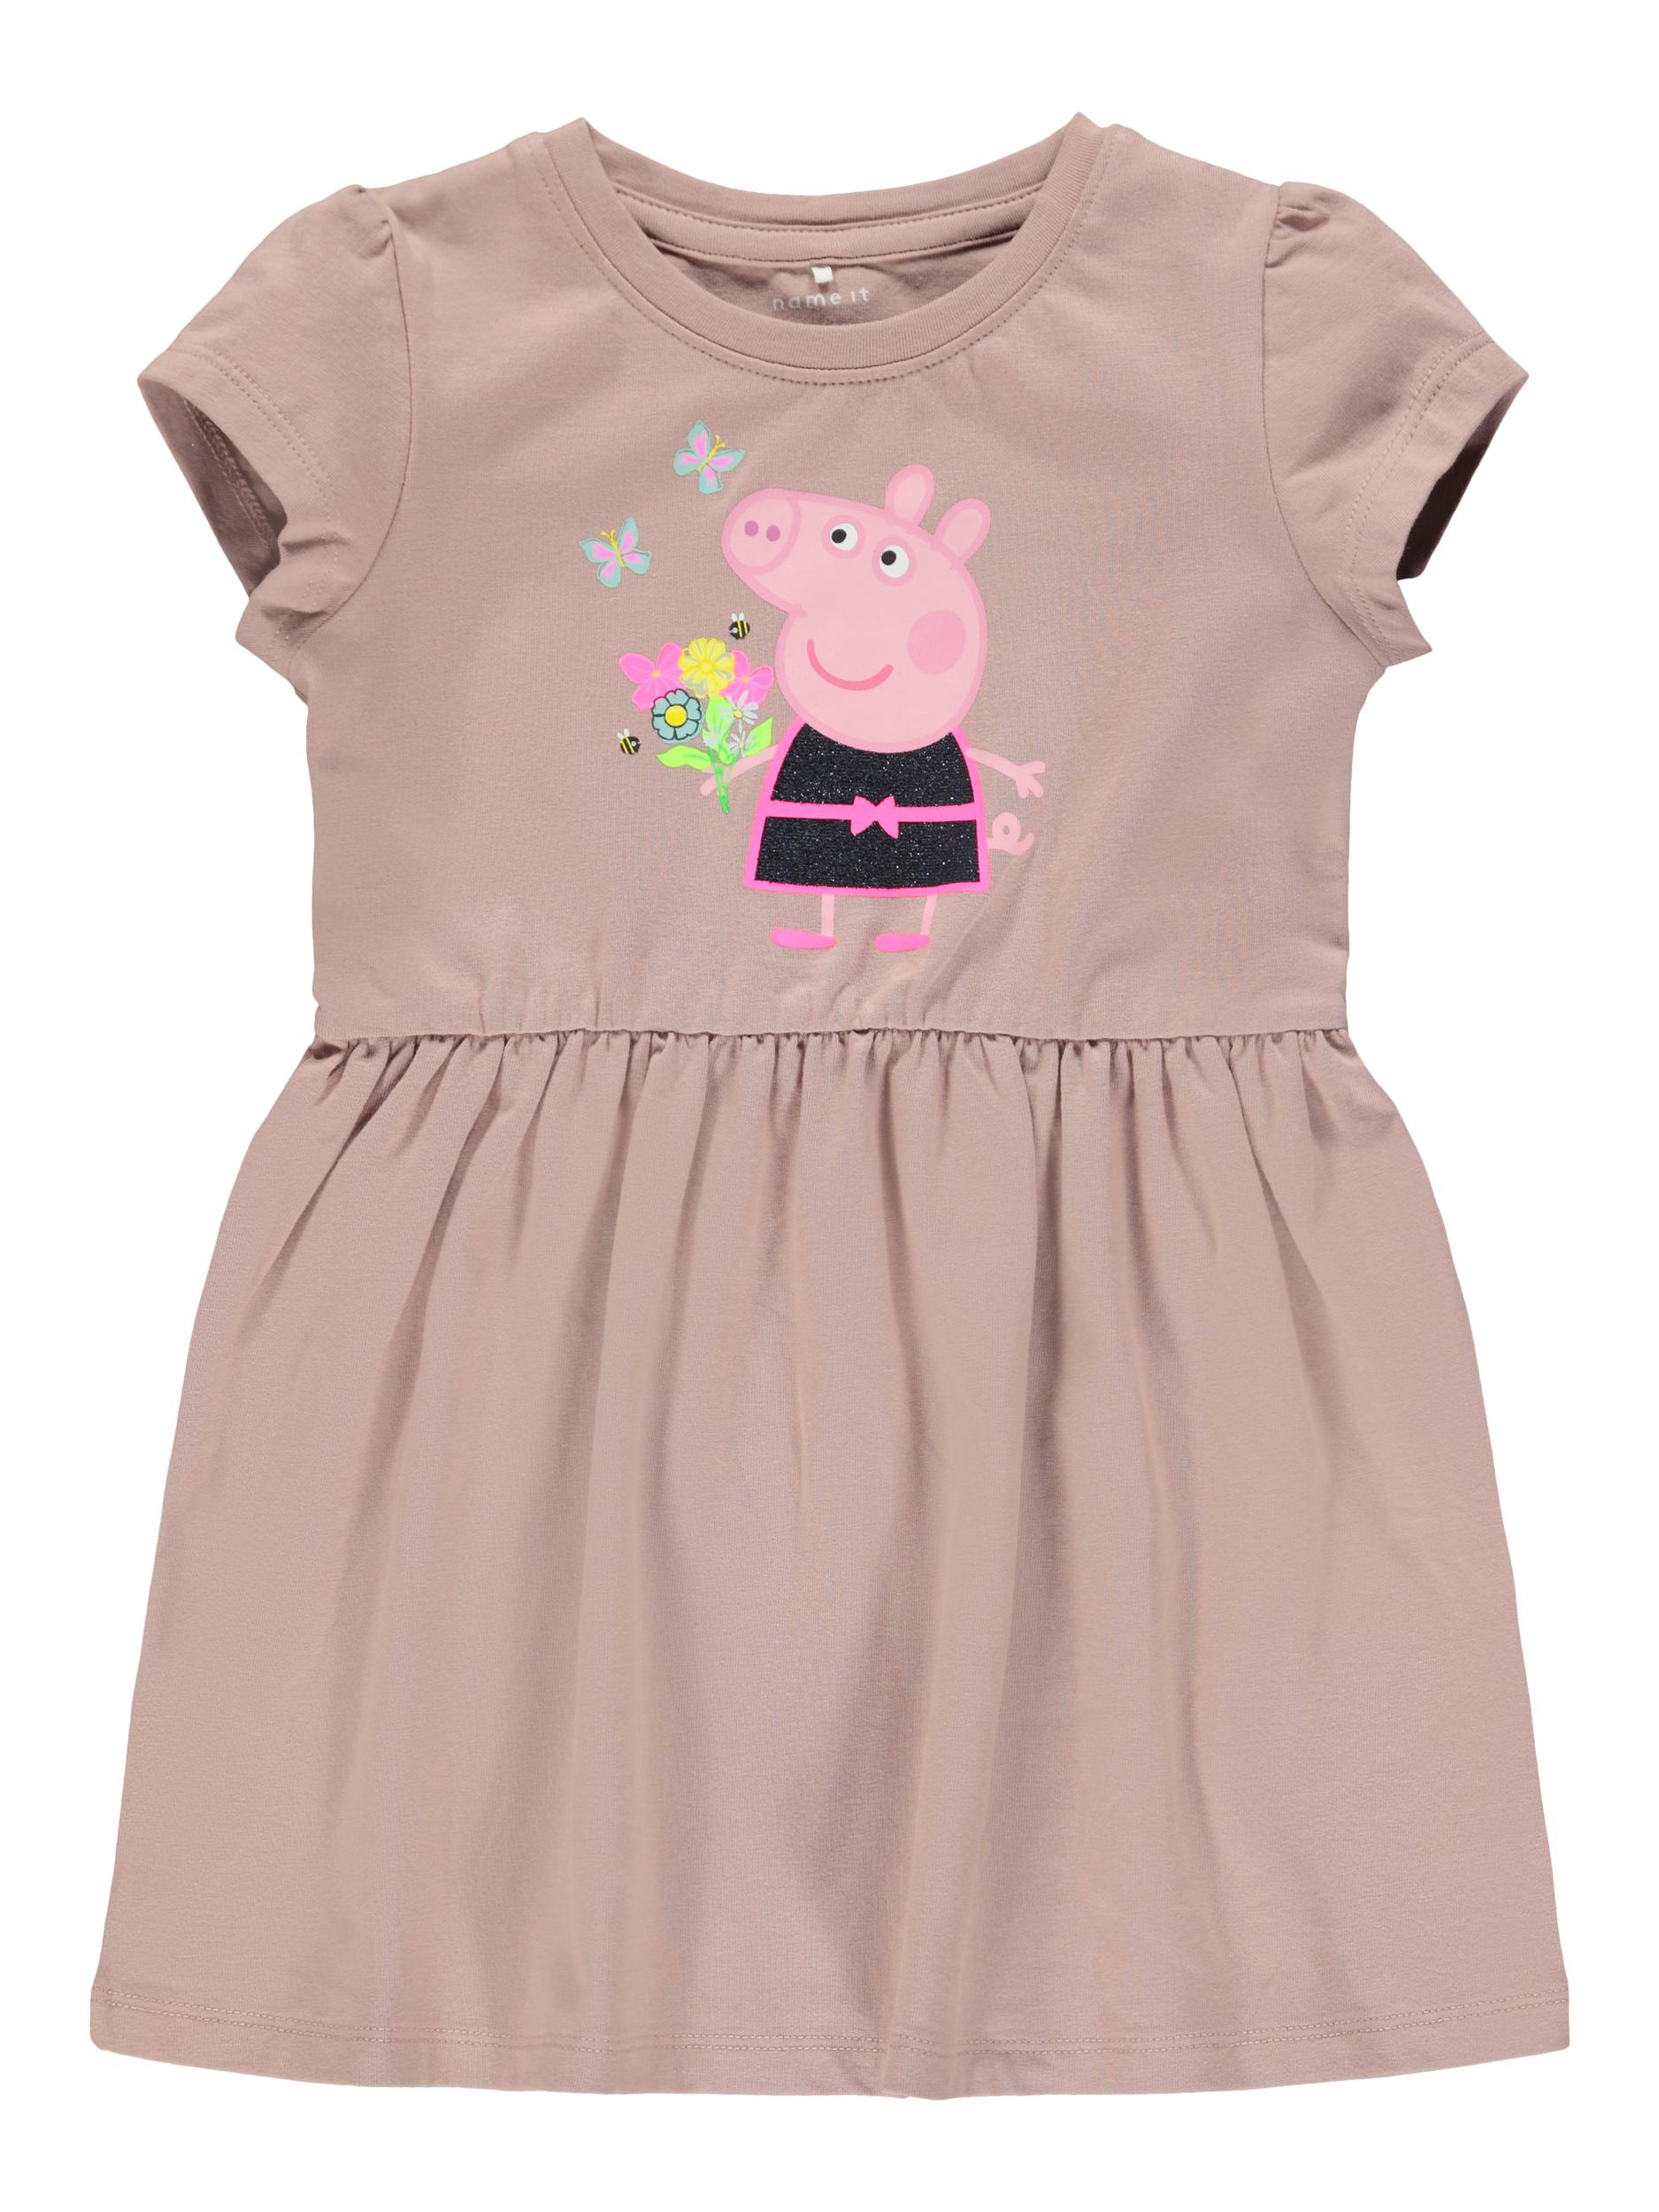 Name It Gurli Gris kjole, adobe rose, 104